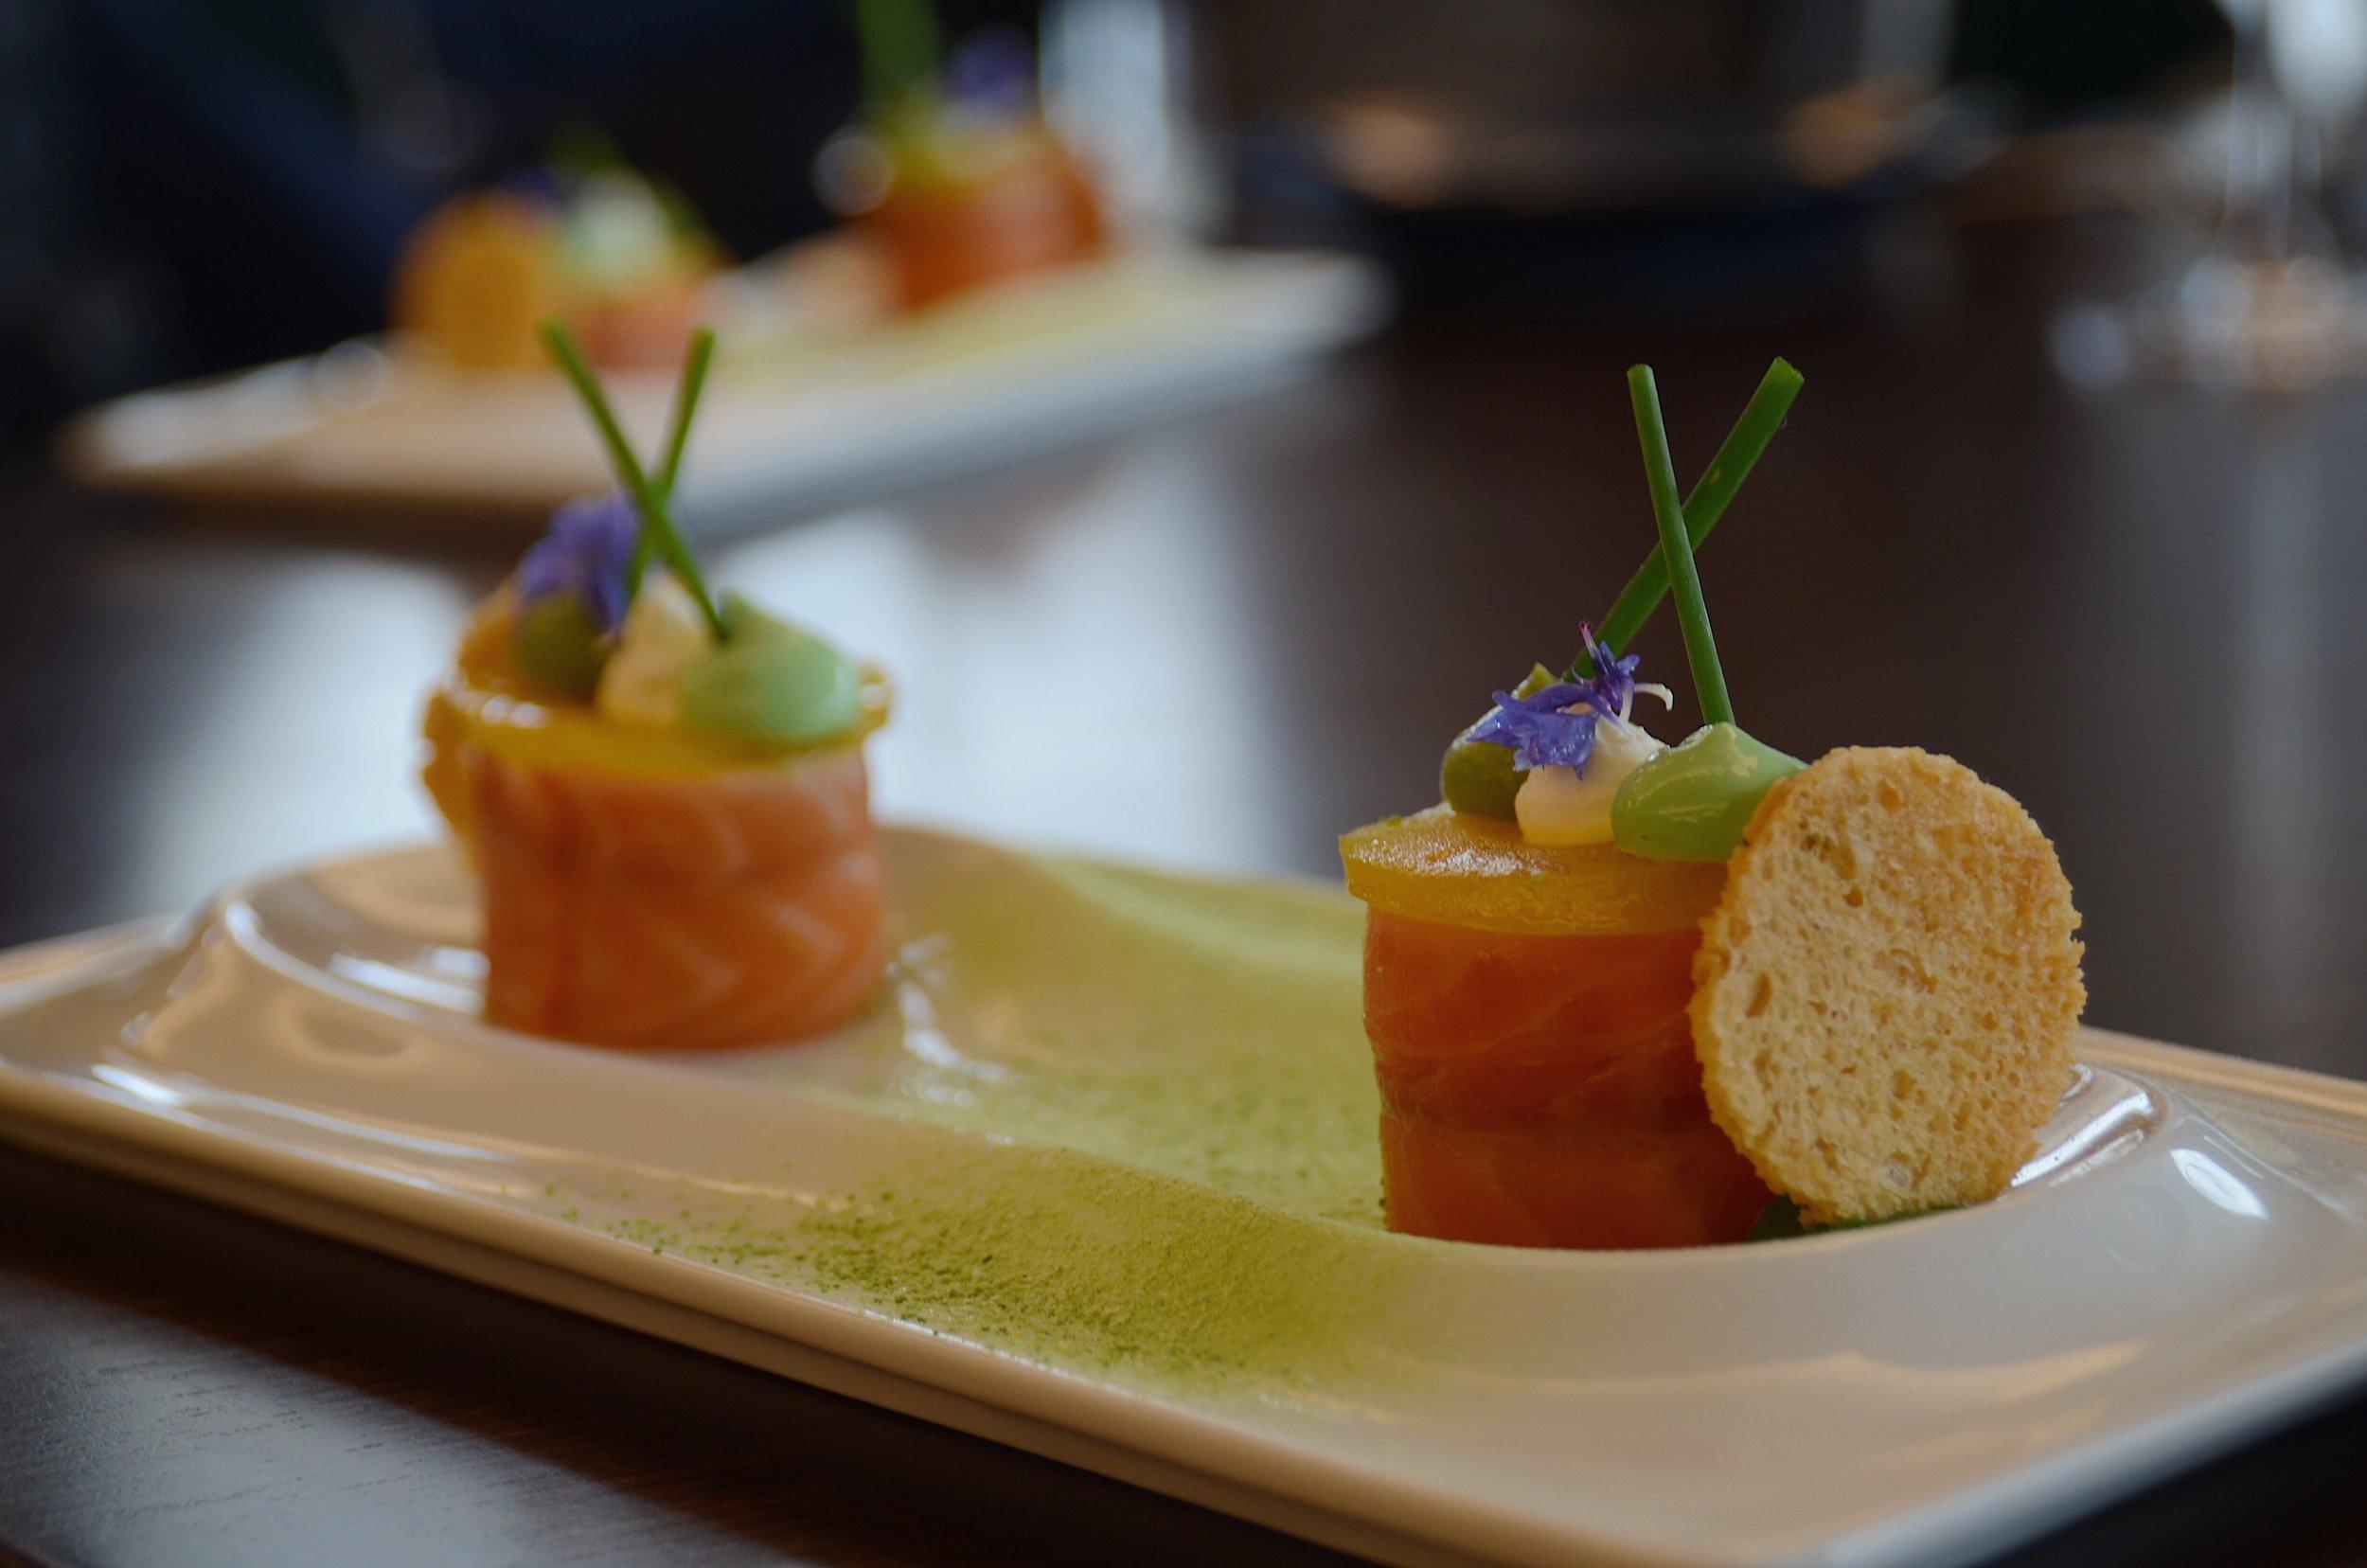 salmon dish side on